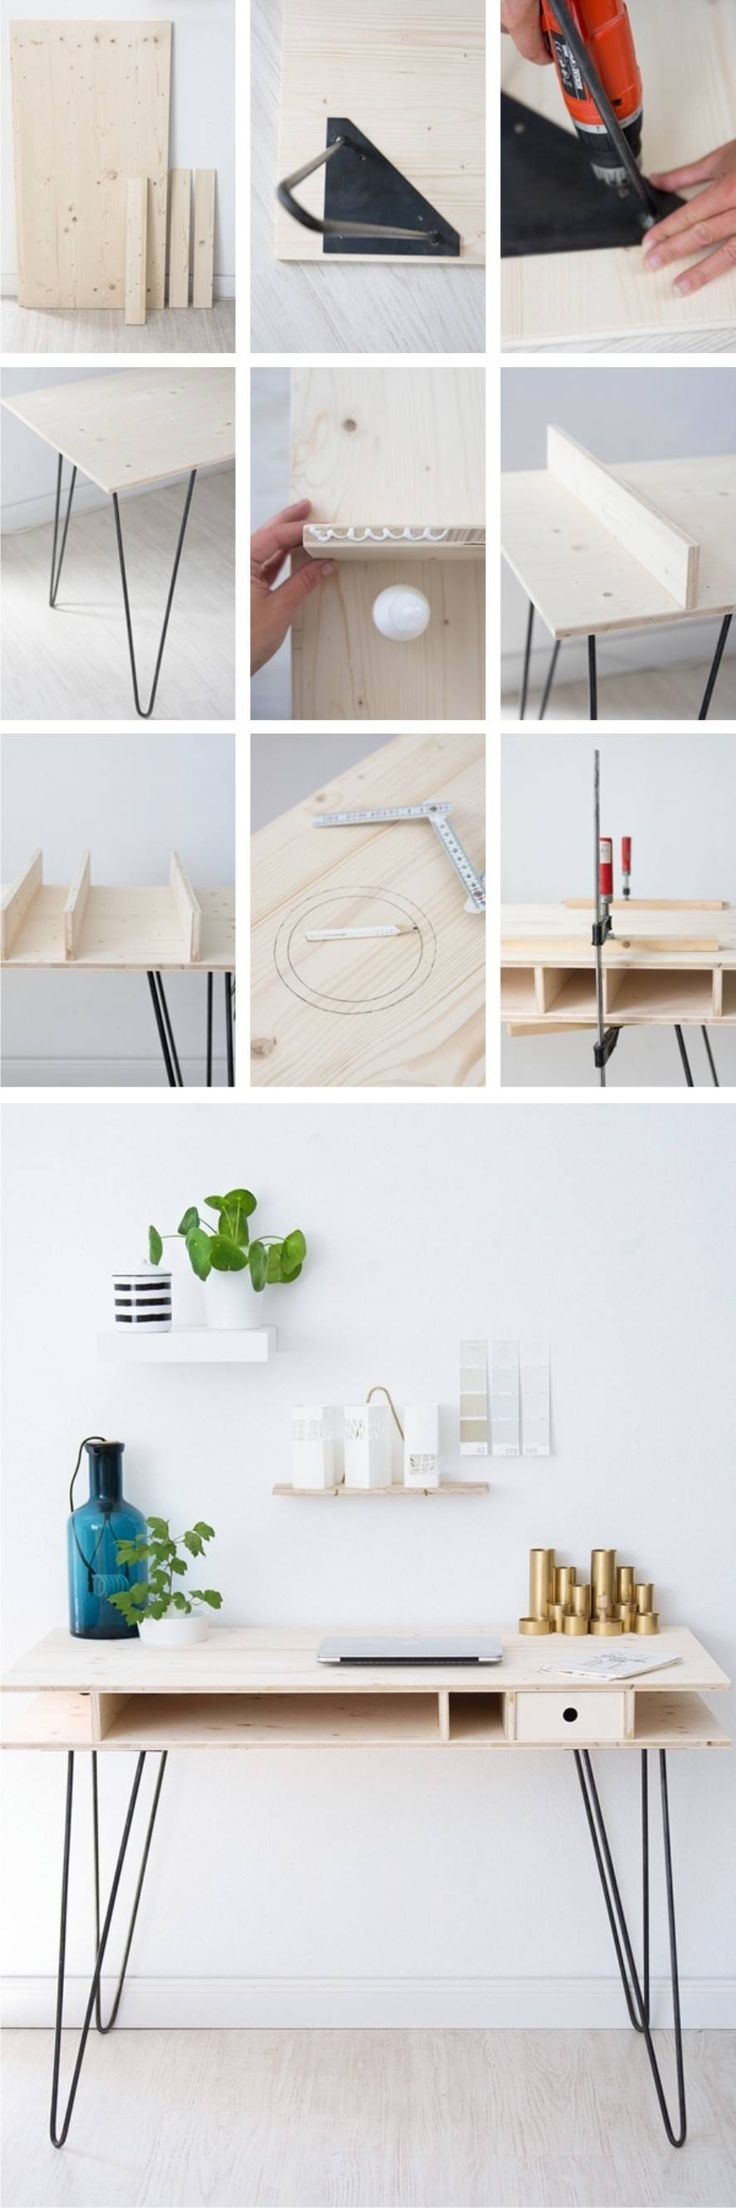 DIY Table with Hairpin Legs - sinnenrausch.blogspot.com - Mesa DIY pies hairpin